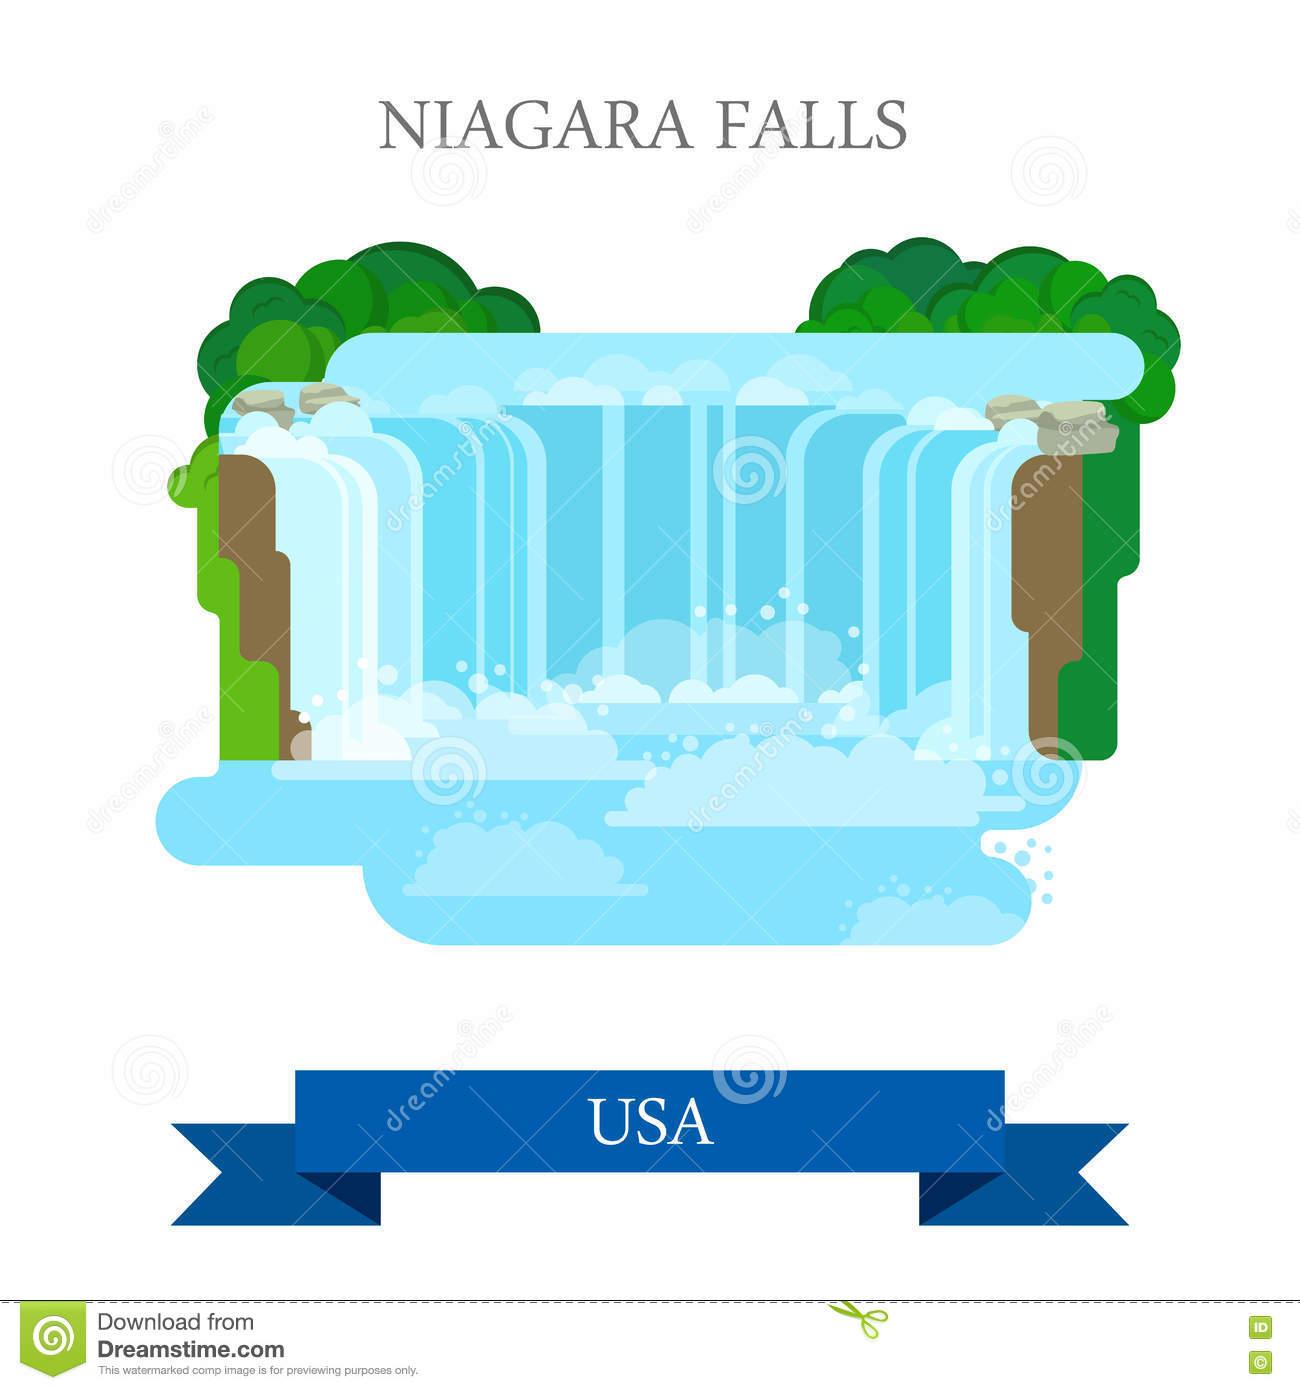 Niagara Falls in United States / Canada.-Niagara Falls in United States / Canada. Flat cart Royalty Free Stock Images-11